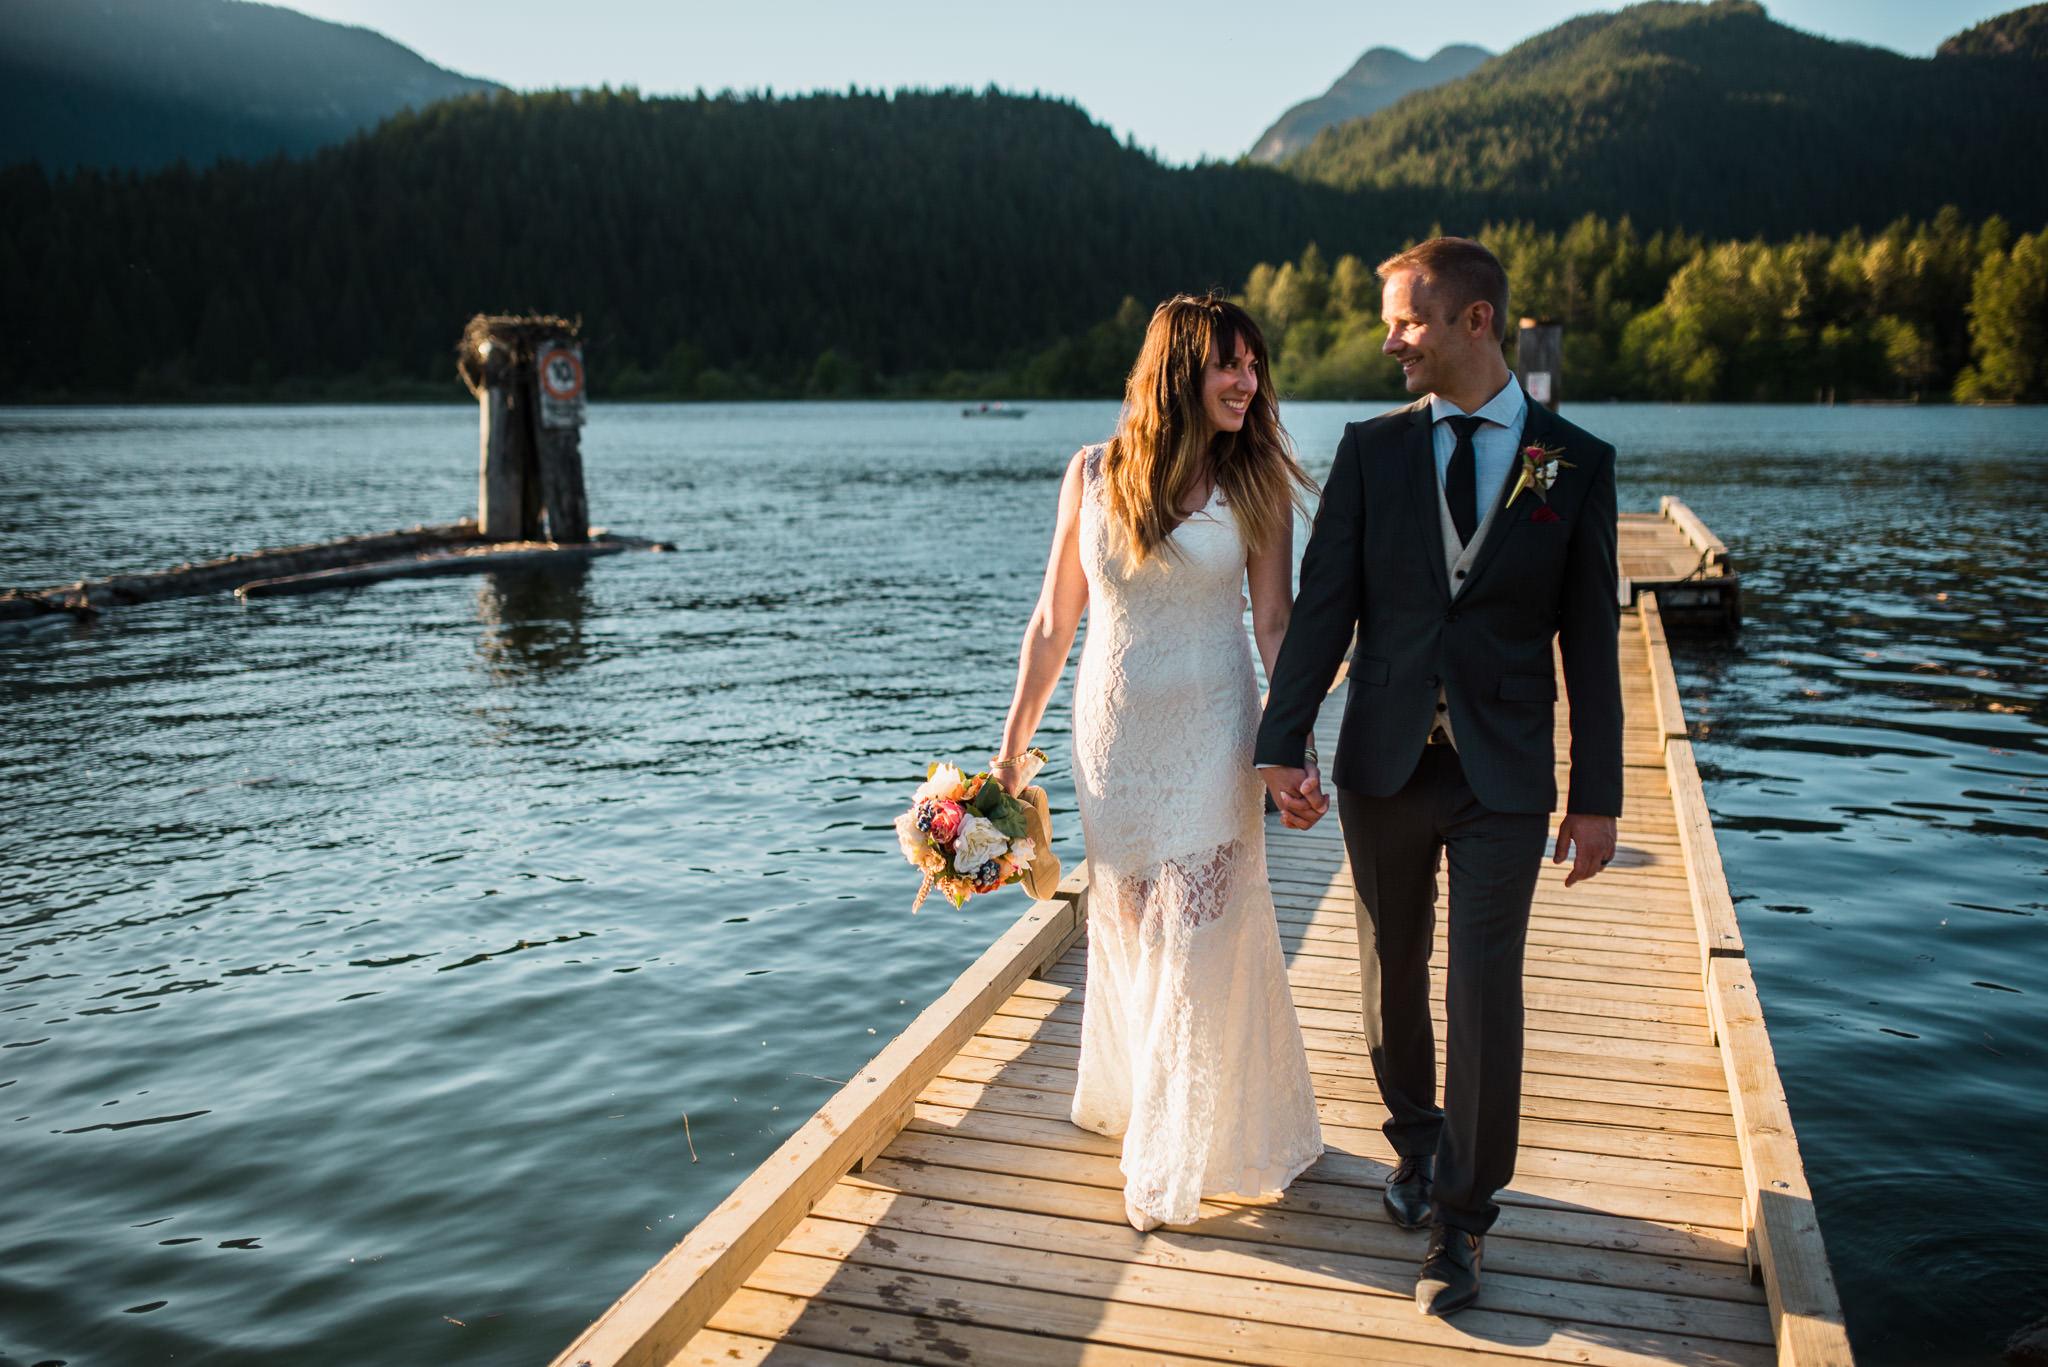 Melanie-Matt-Pitt-Lake-Post-Wedding-Shoot-Victoria-Wedding-Photographers-17.jpg